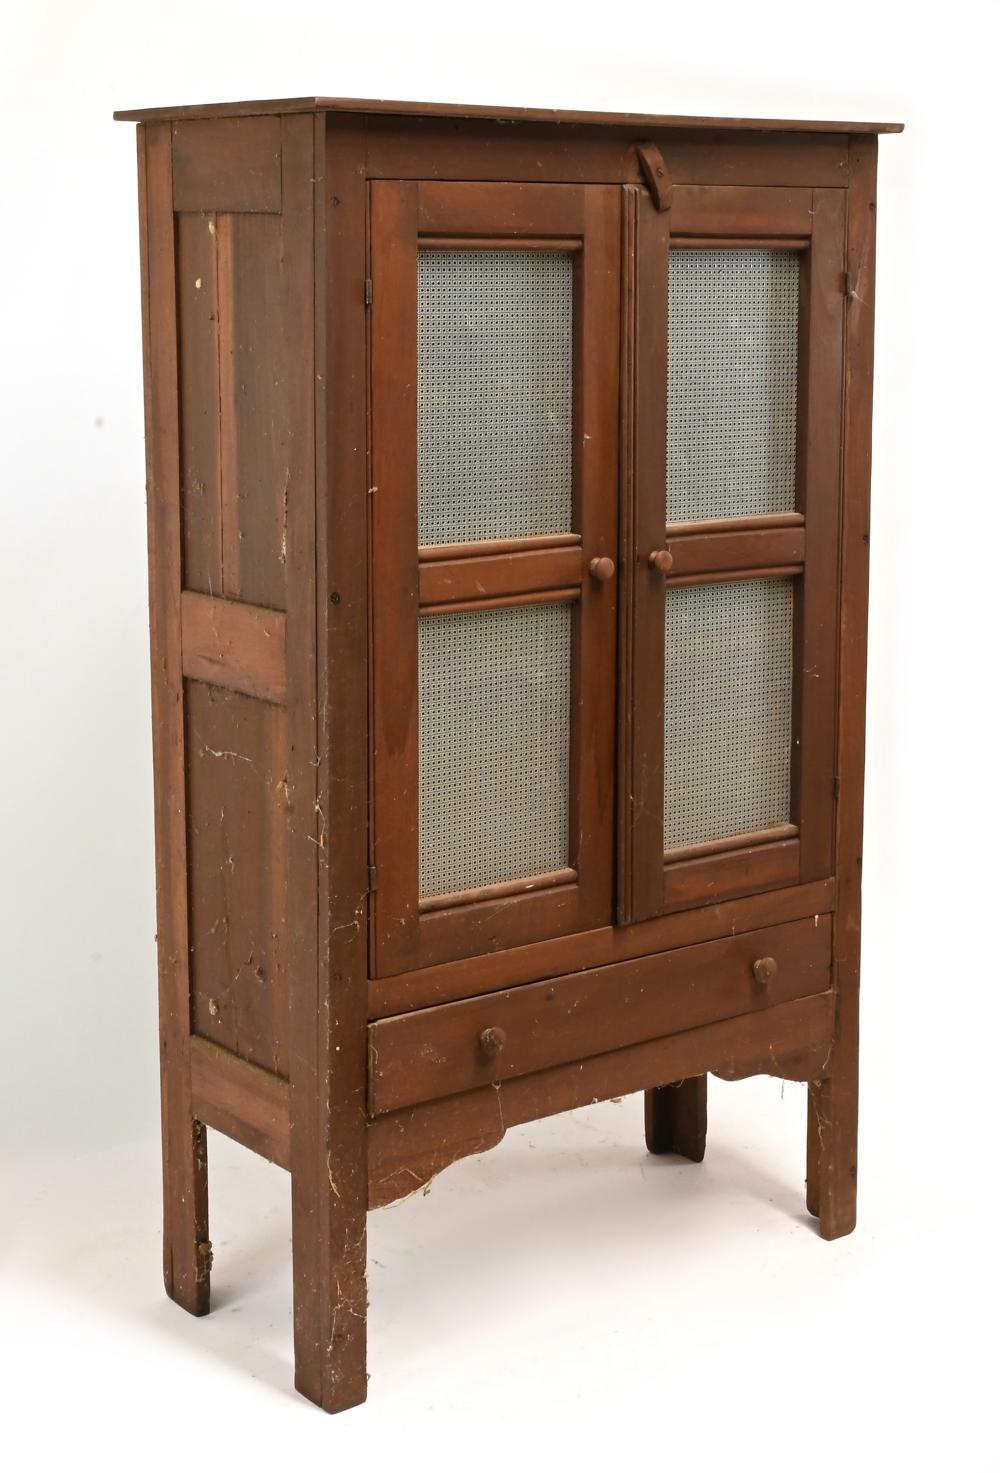 Antique Pie Safe Cupboard